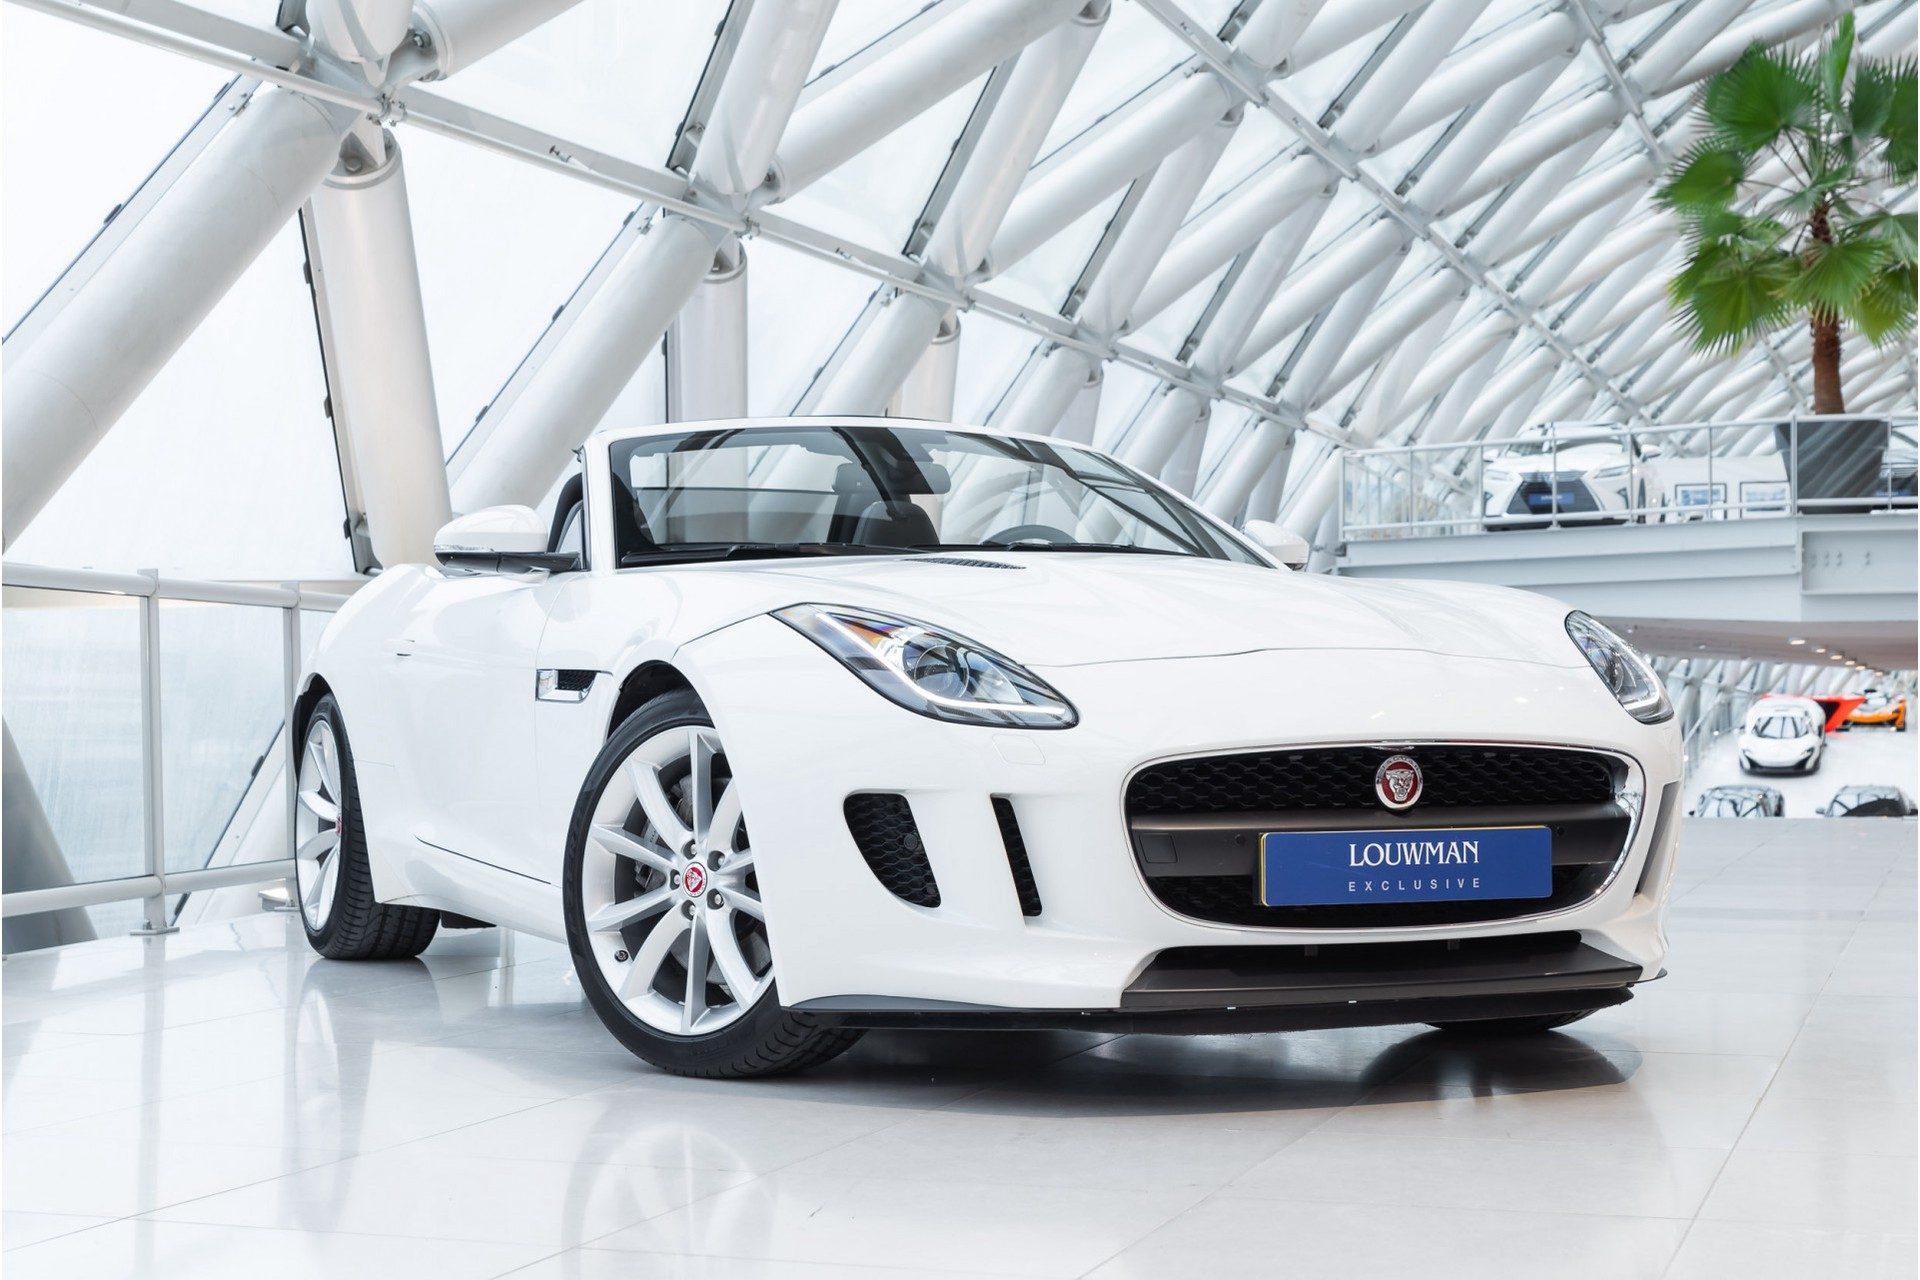 Jaguar F-Type 3.0 V6 Convertible | Low mileage | Top condition